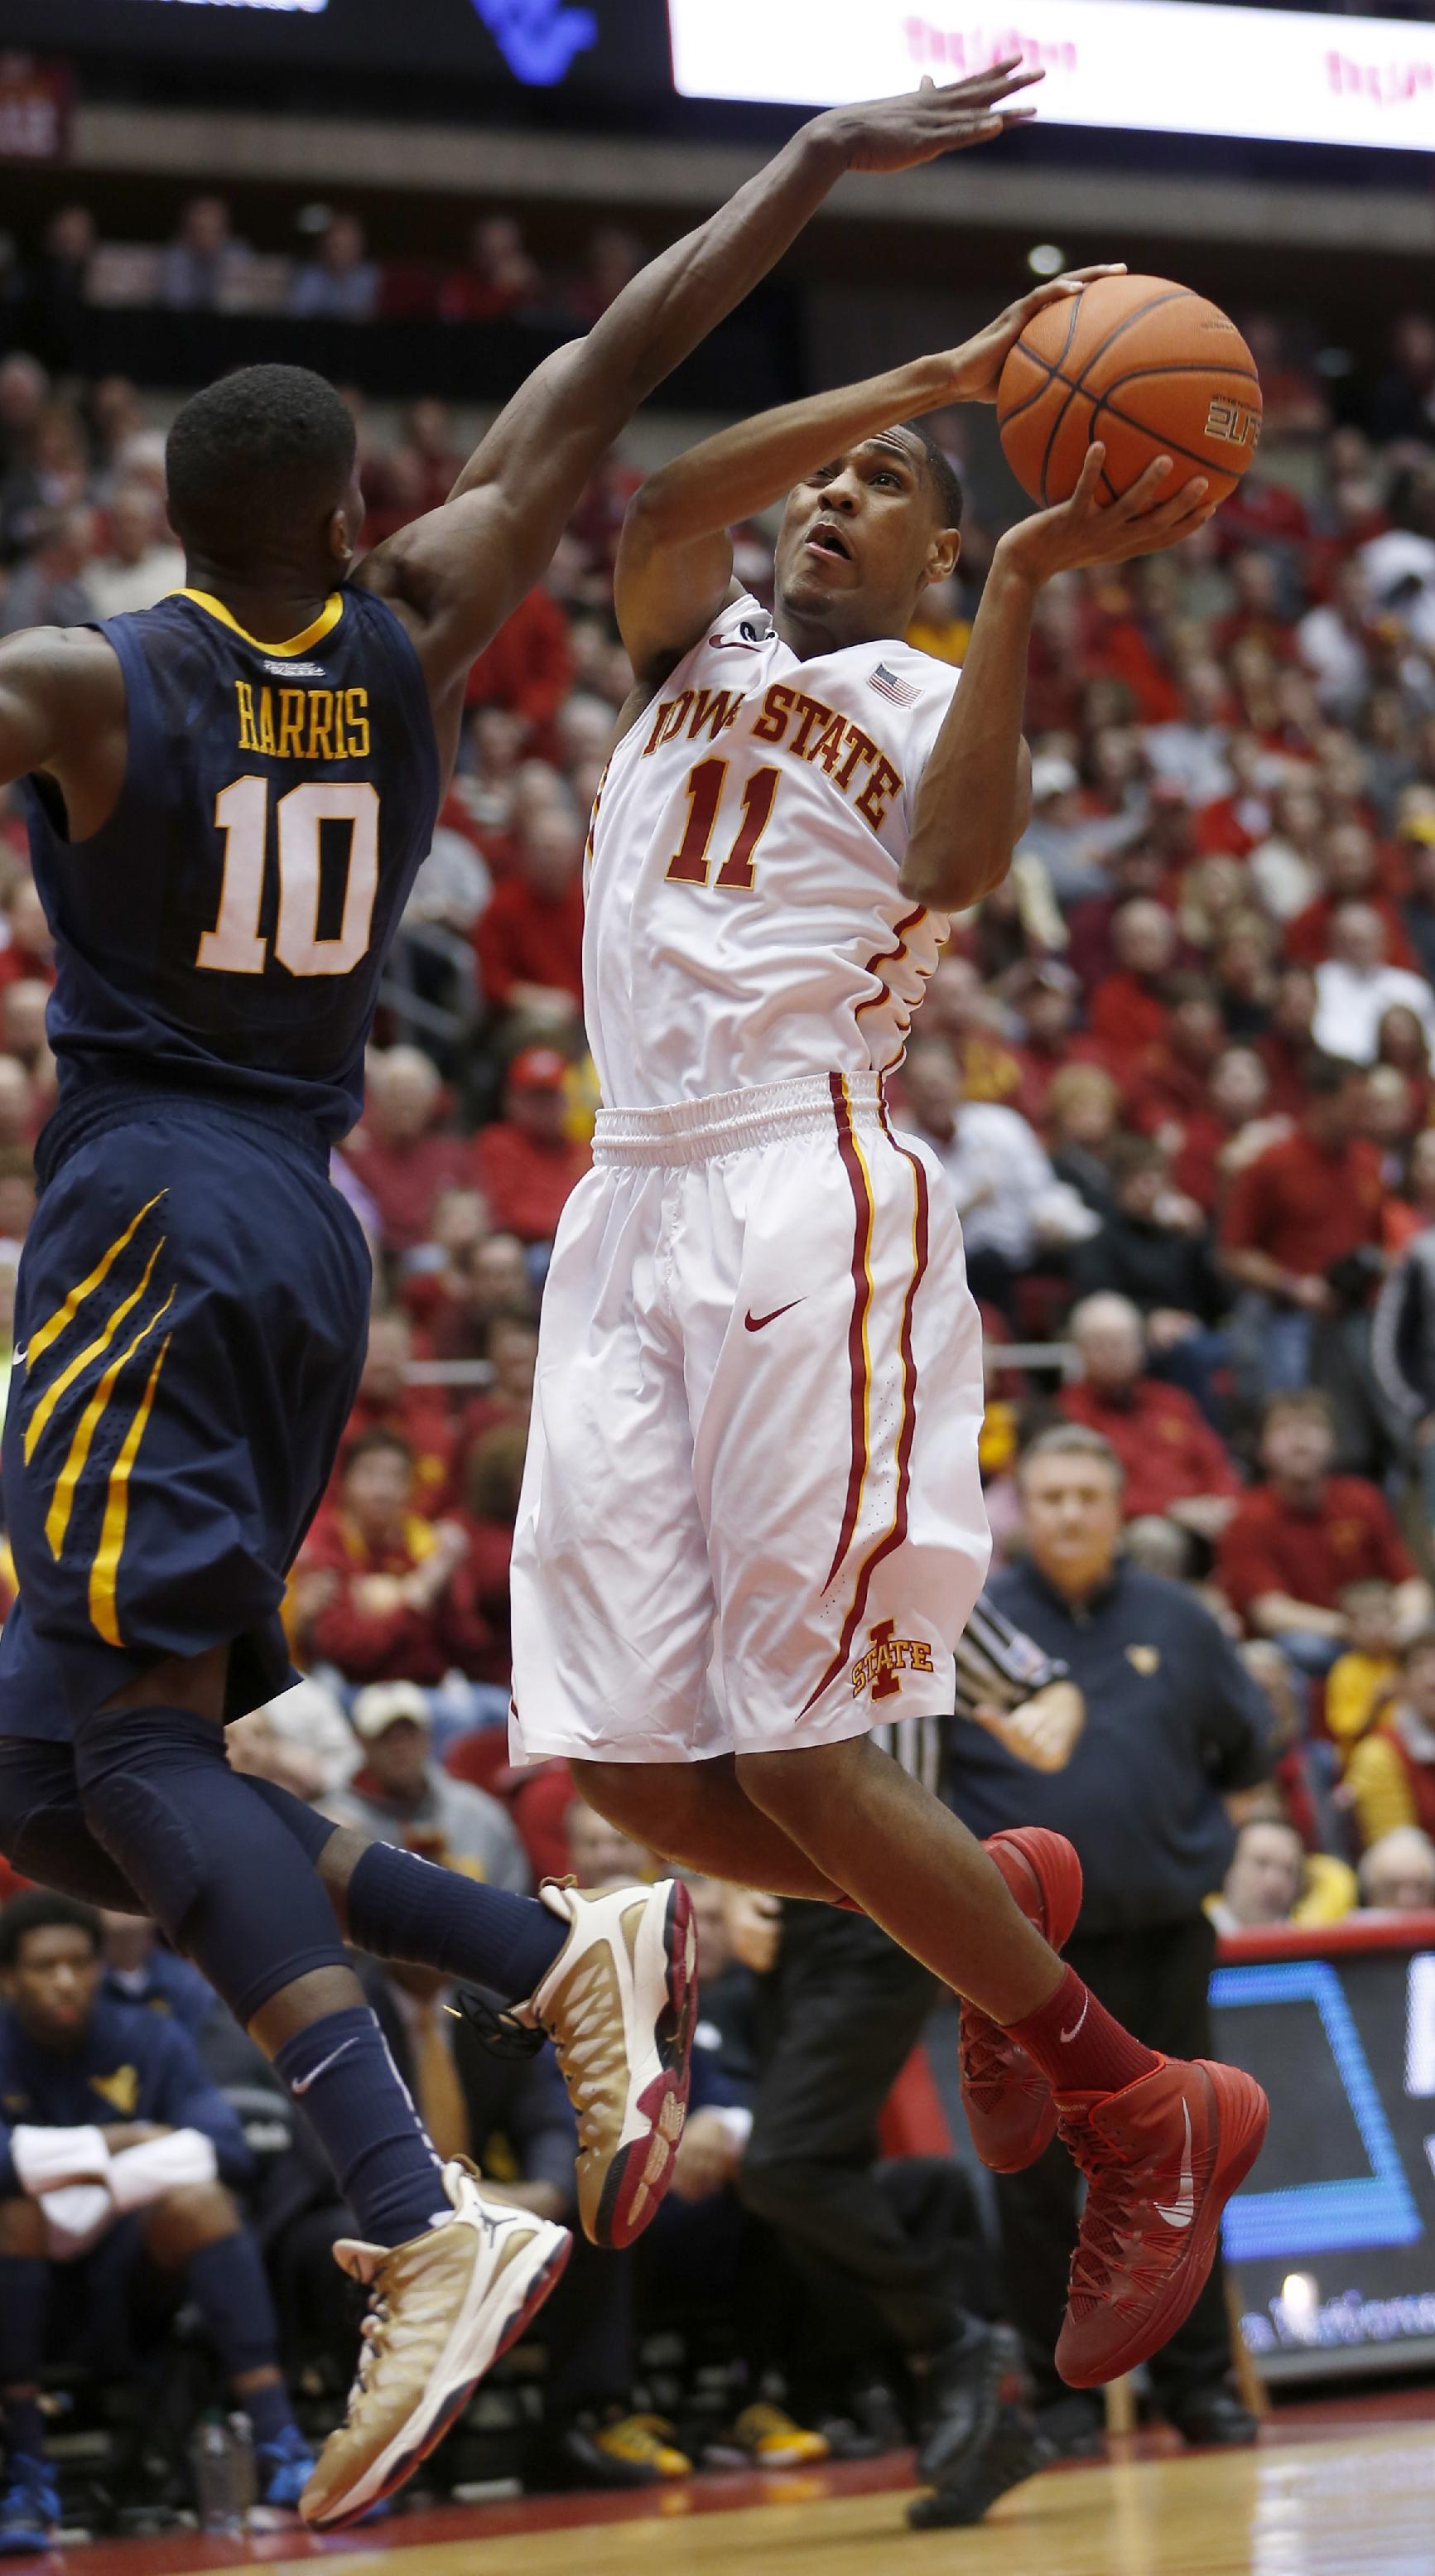 Iowa St freshman PG Morris on pace for NCAA mark